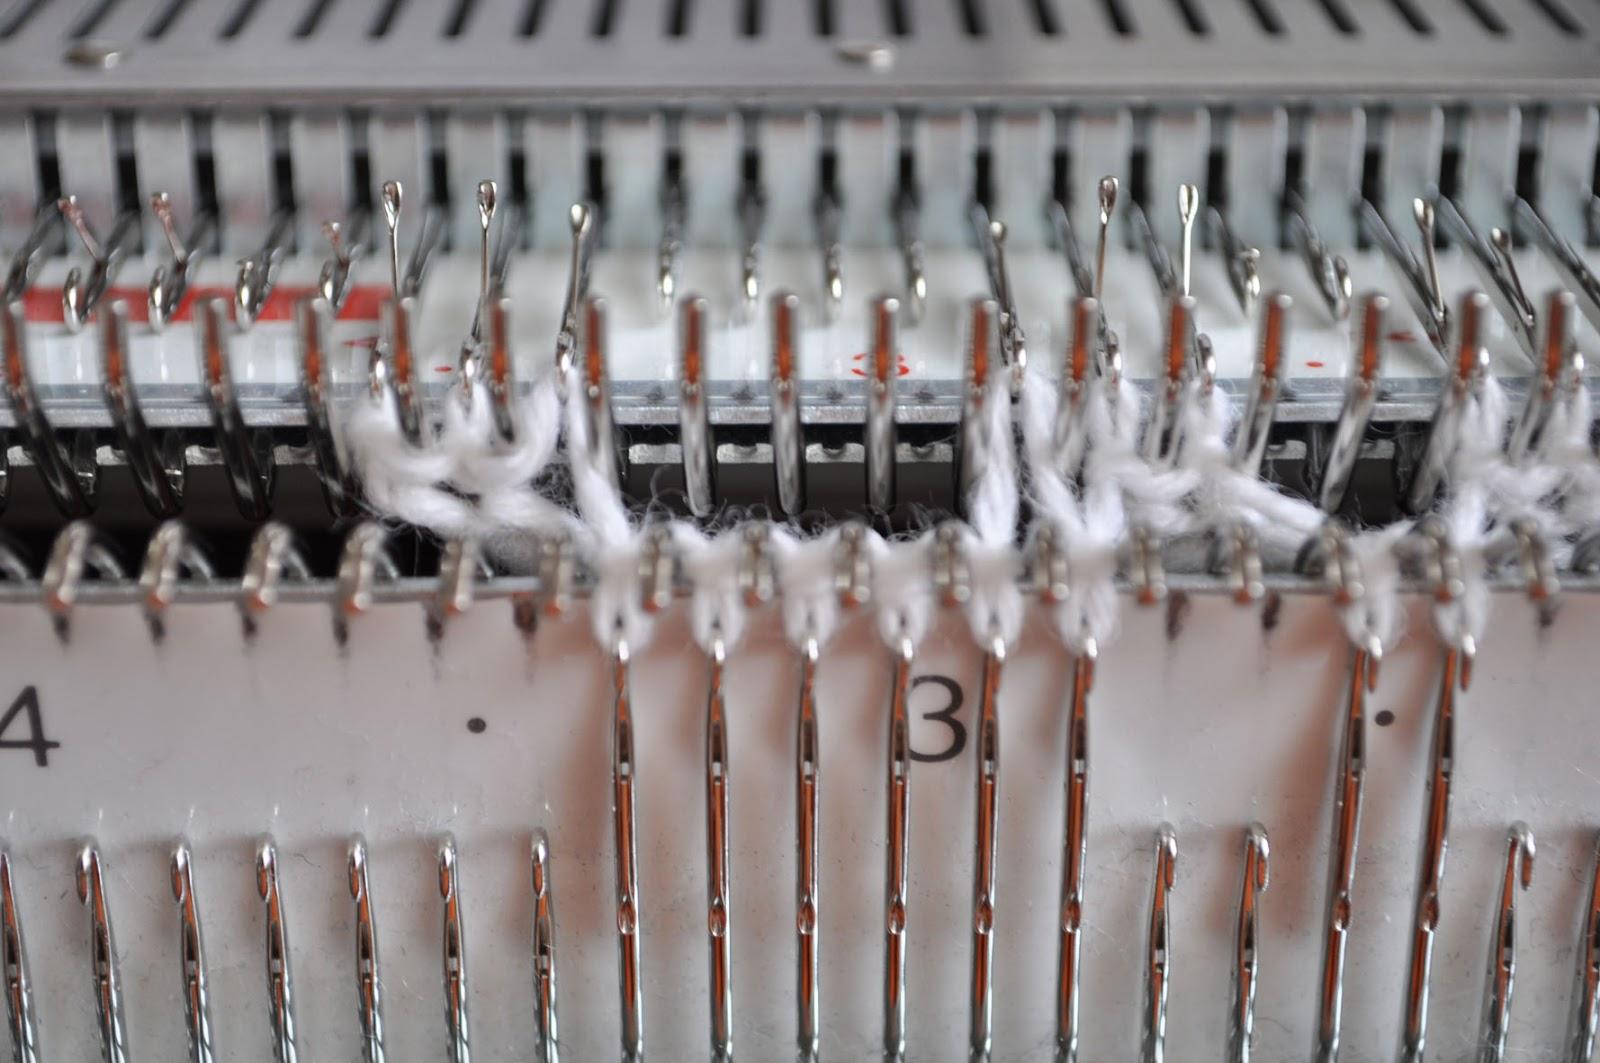 Кайма спицами схемы и описание вязания по фото-видео МК